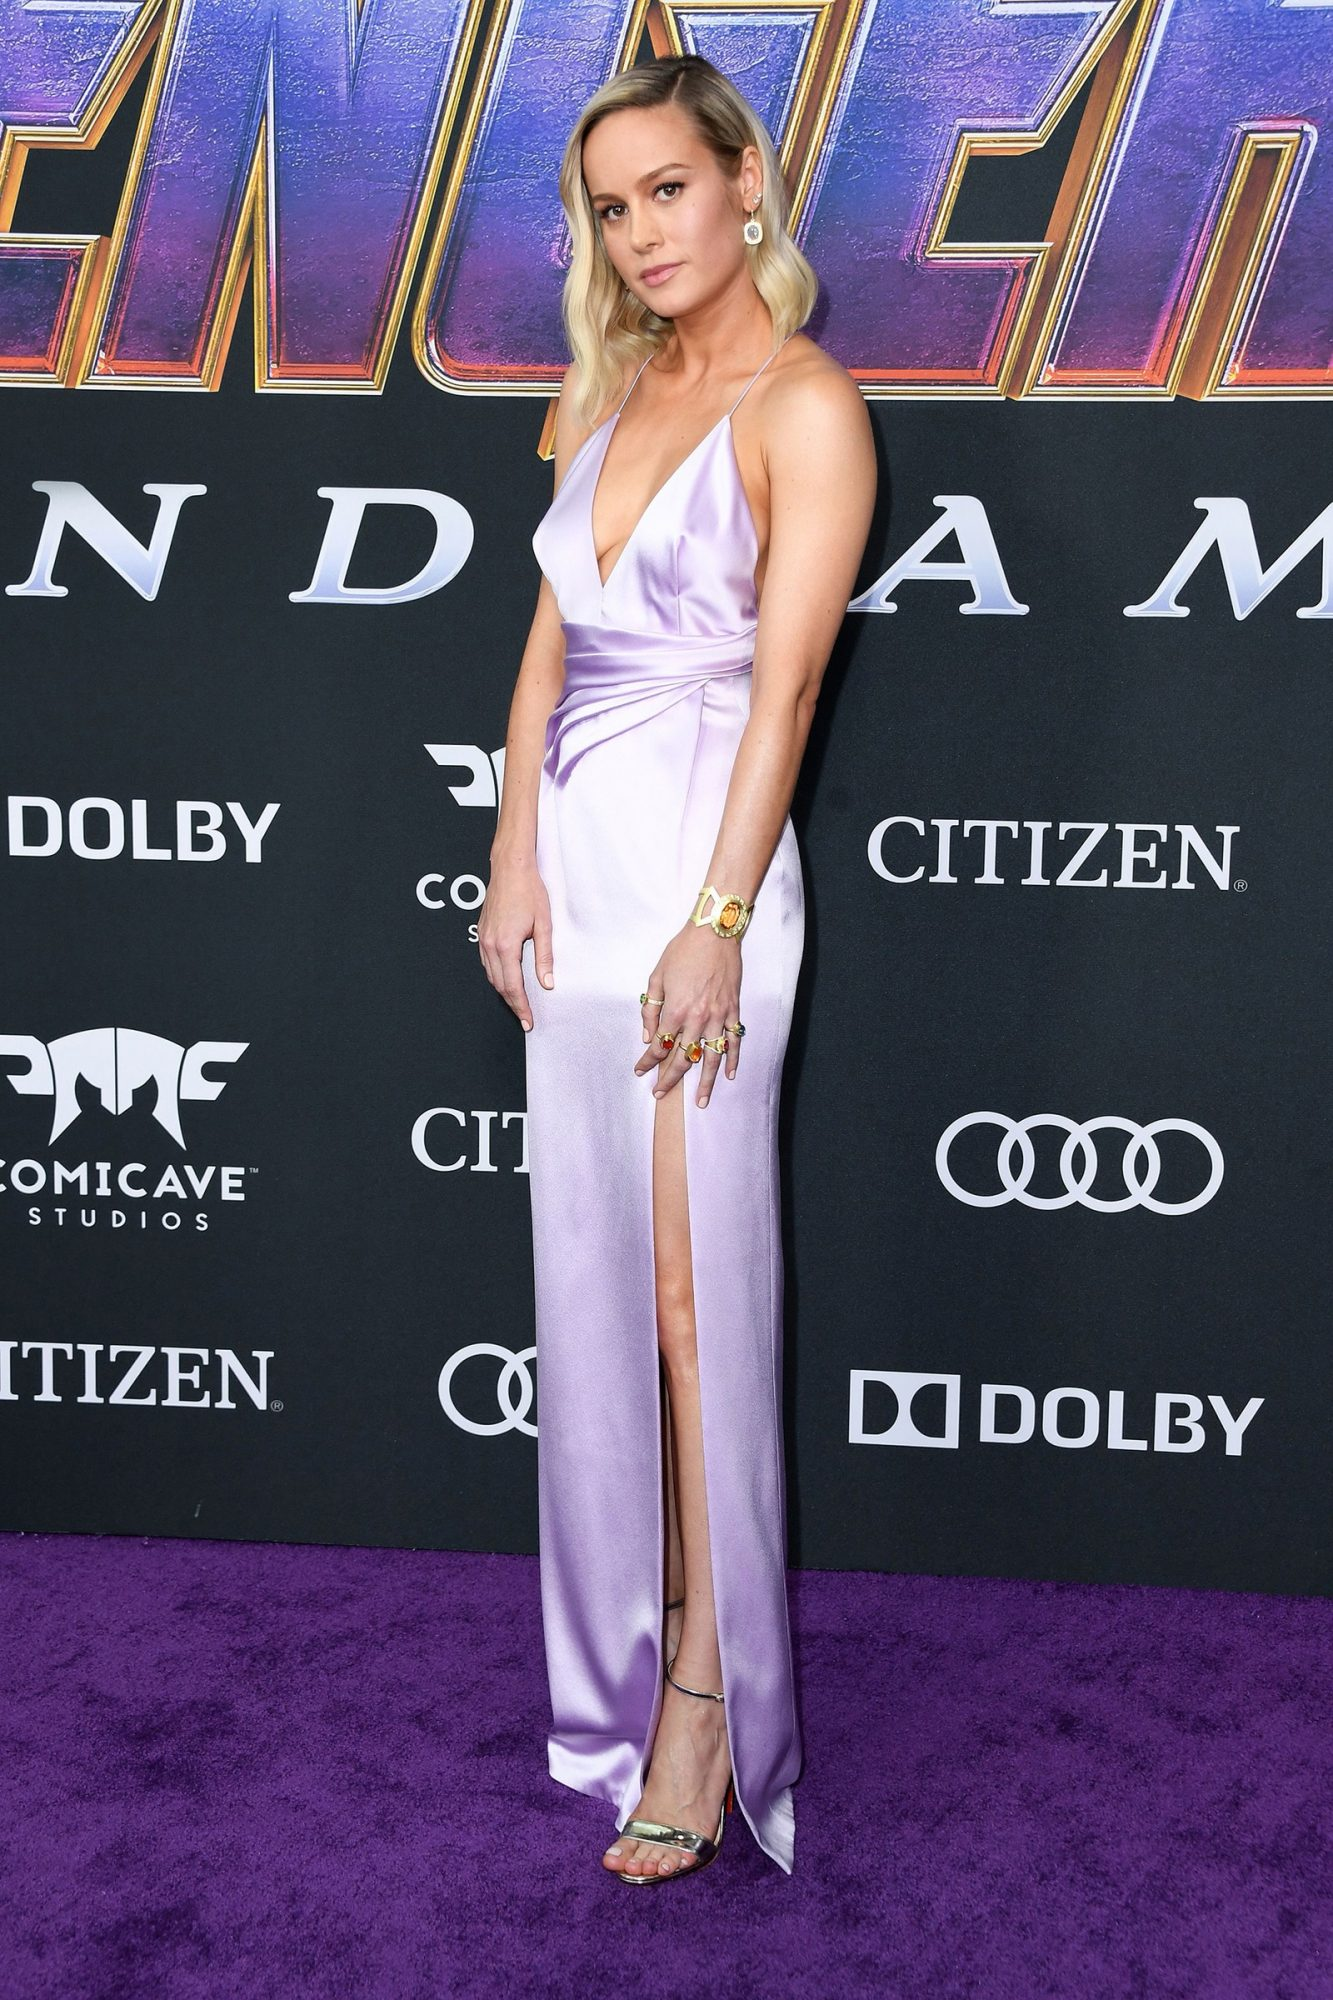 Brie Larson in hot dress at Avengers Endgame premiere